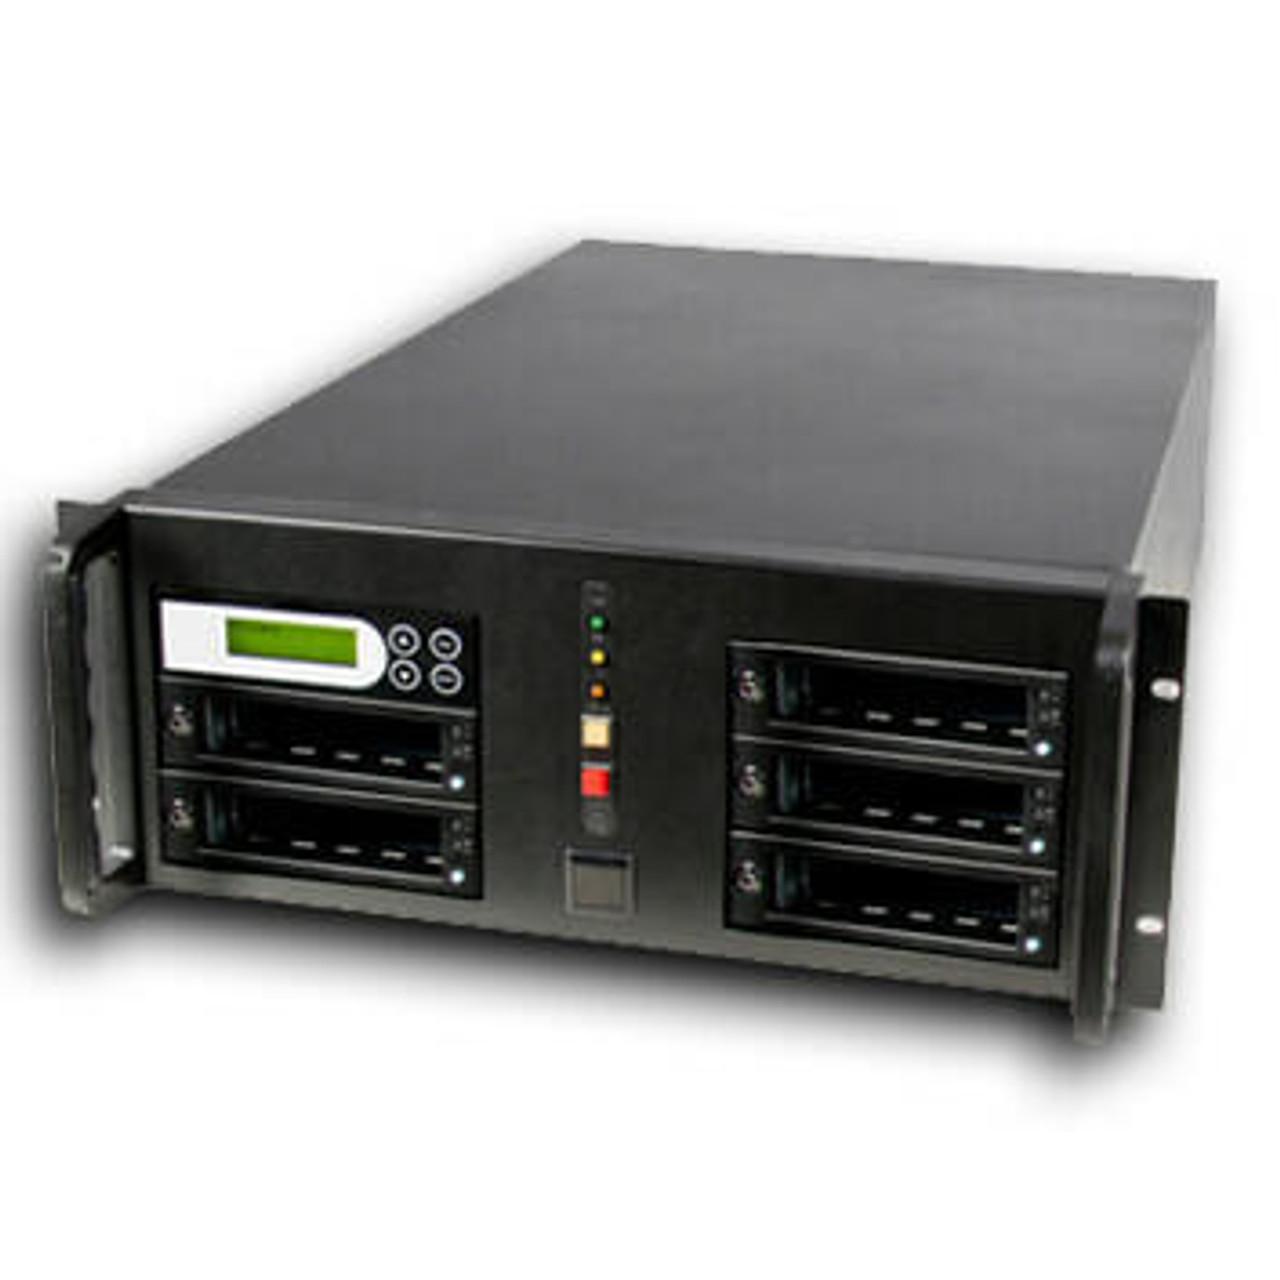 CinemaHDC CRU HDD/SSD Duplicator for Digital Movie Distribution